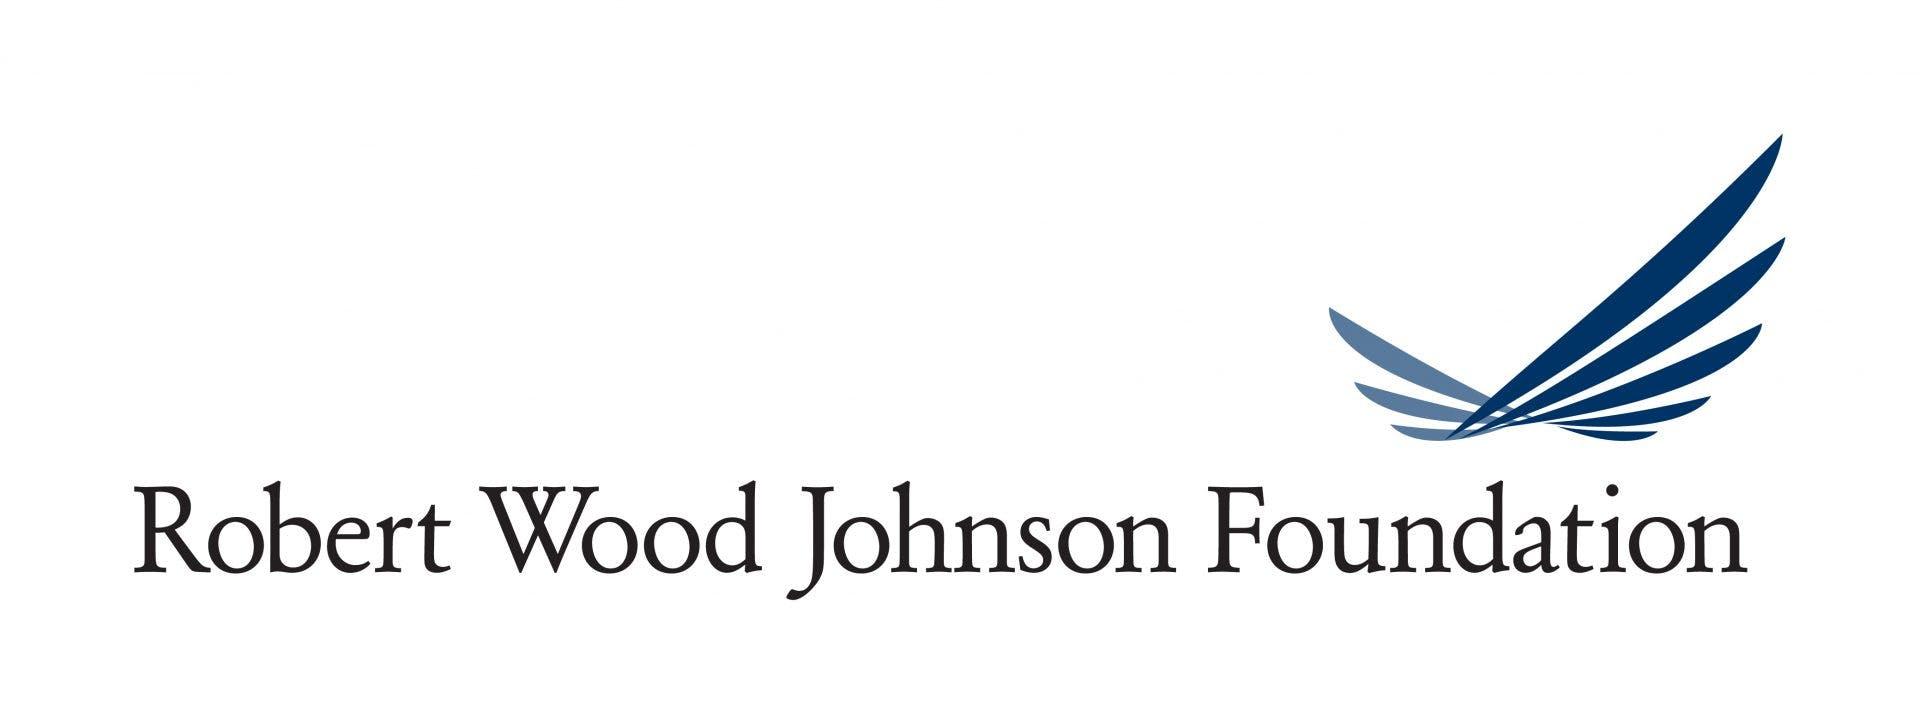 The logo for the Robert Wood Johnson Foundation.